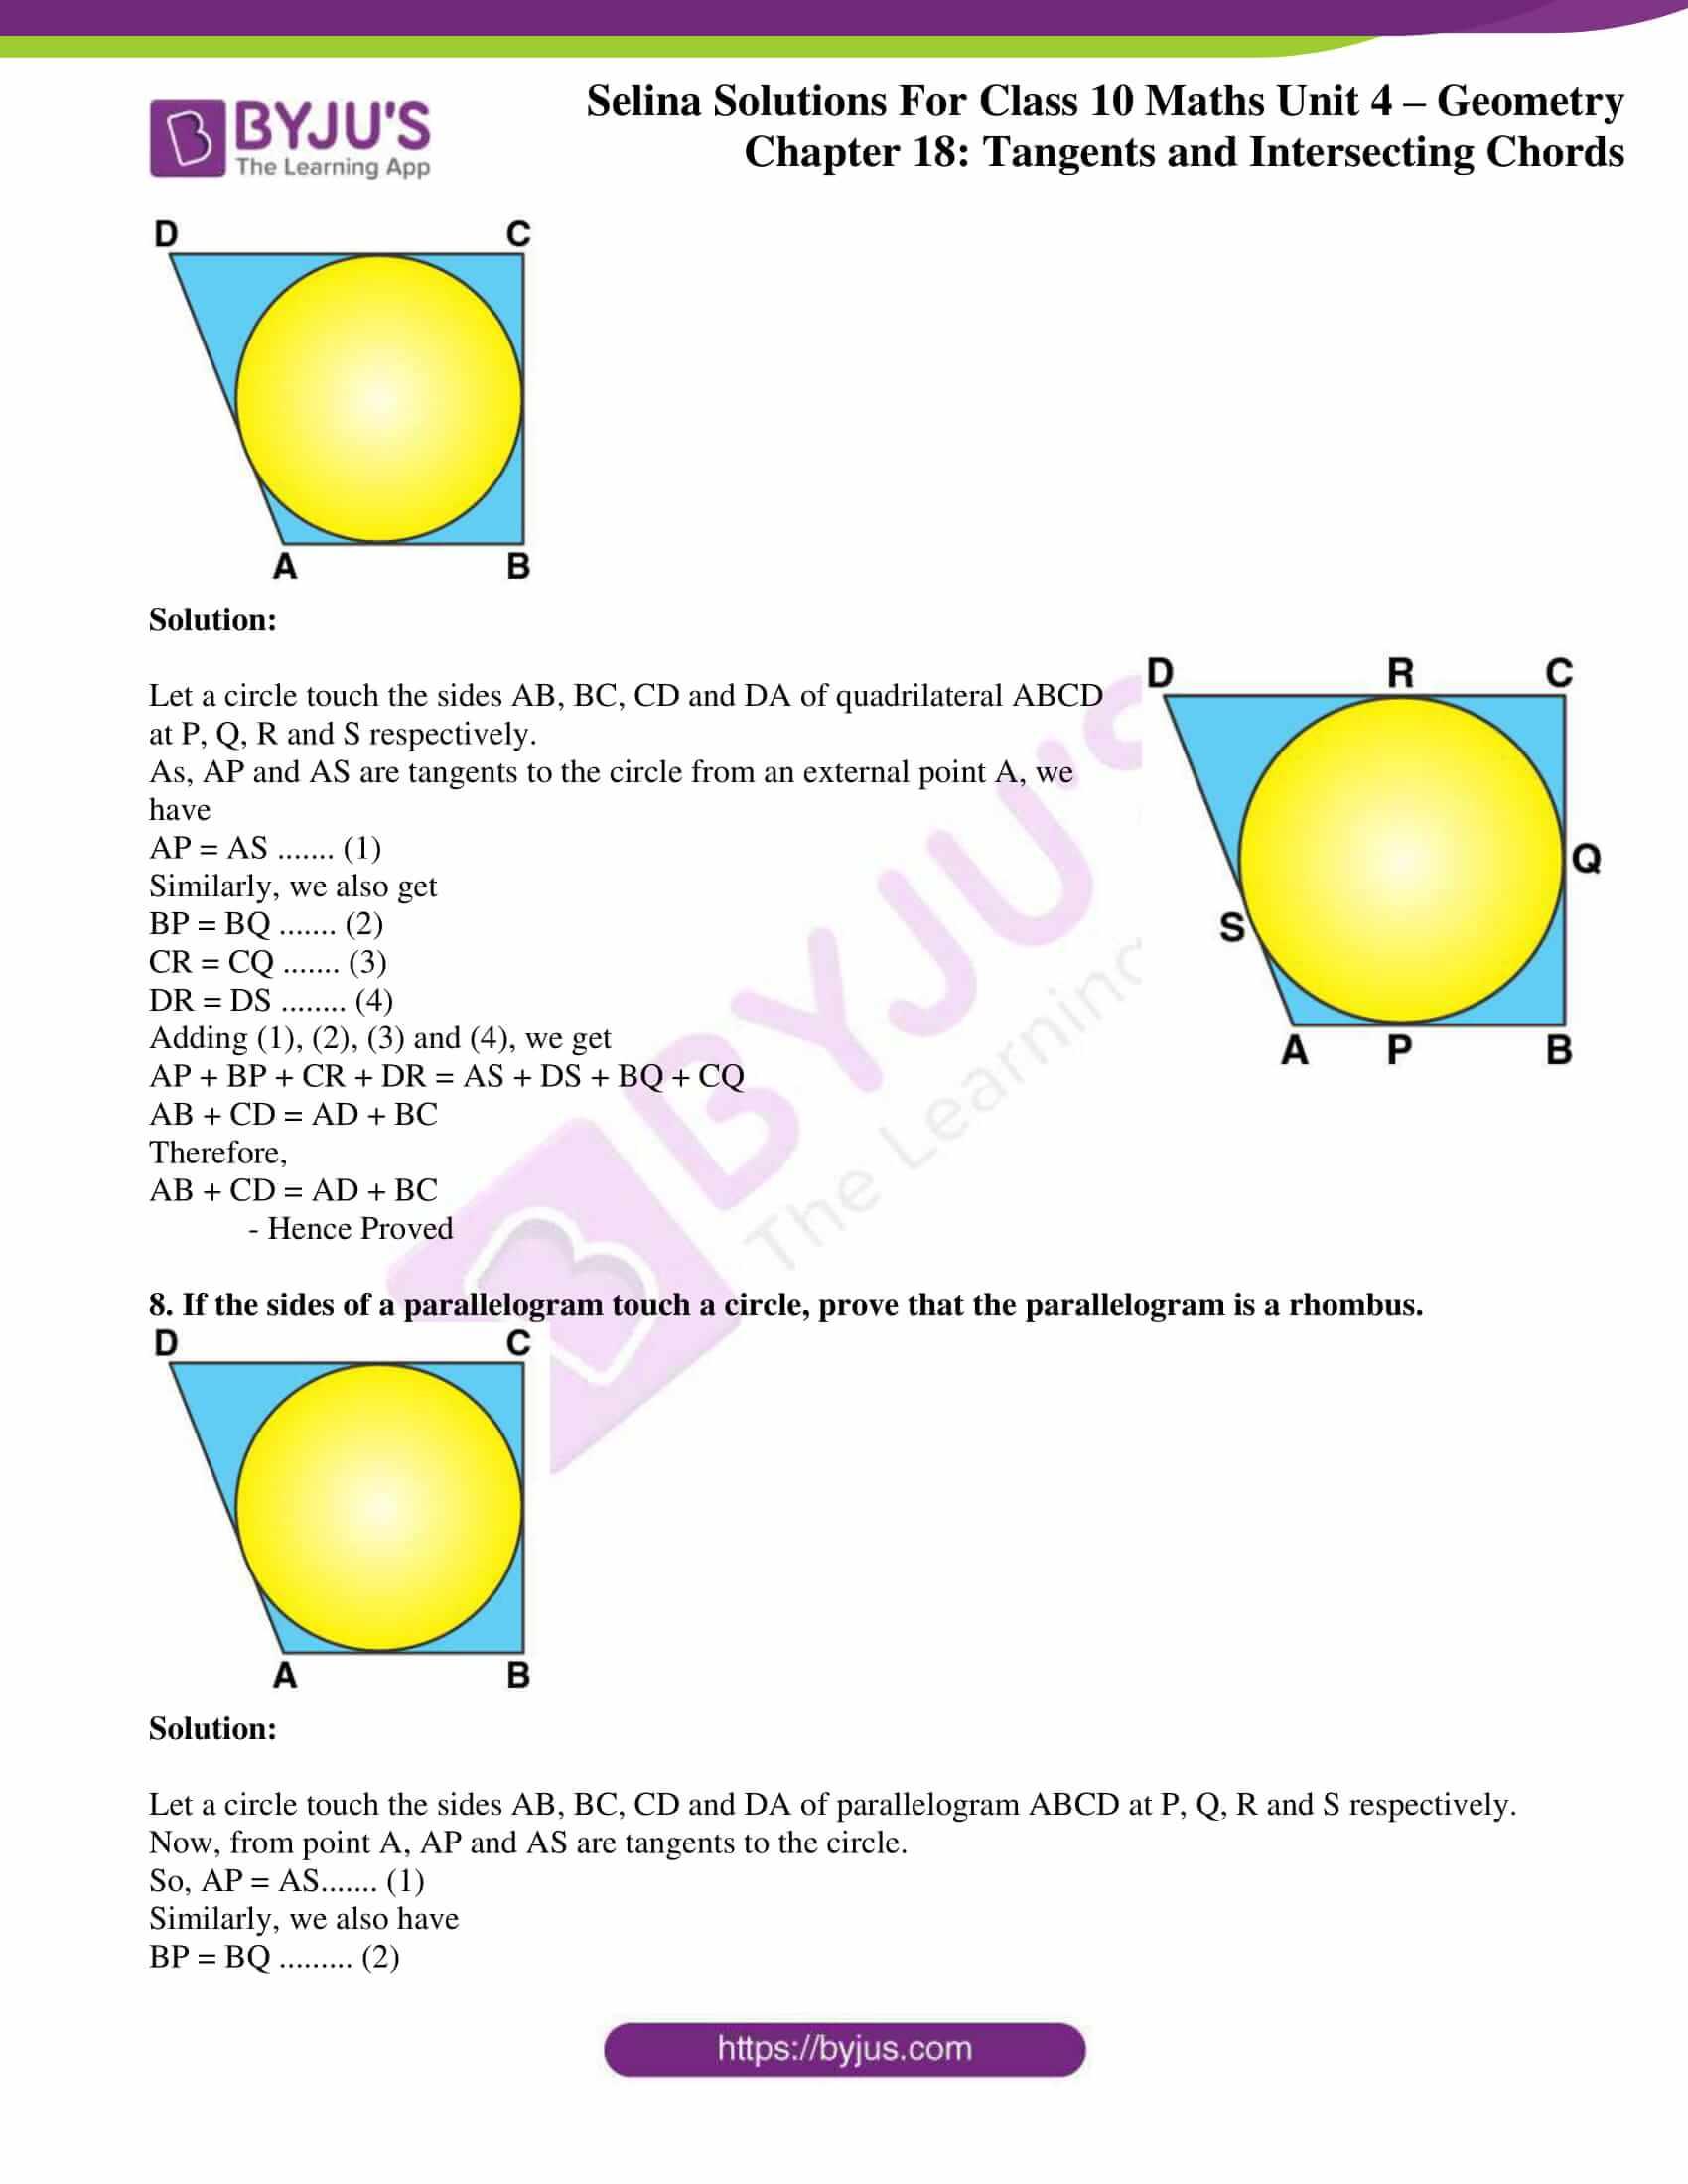 selina-sol-maths-class-10-ch-18-ex-a-4